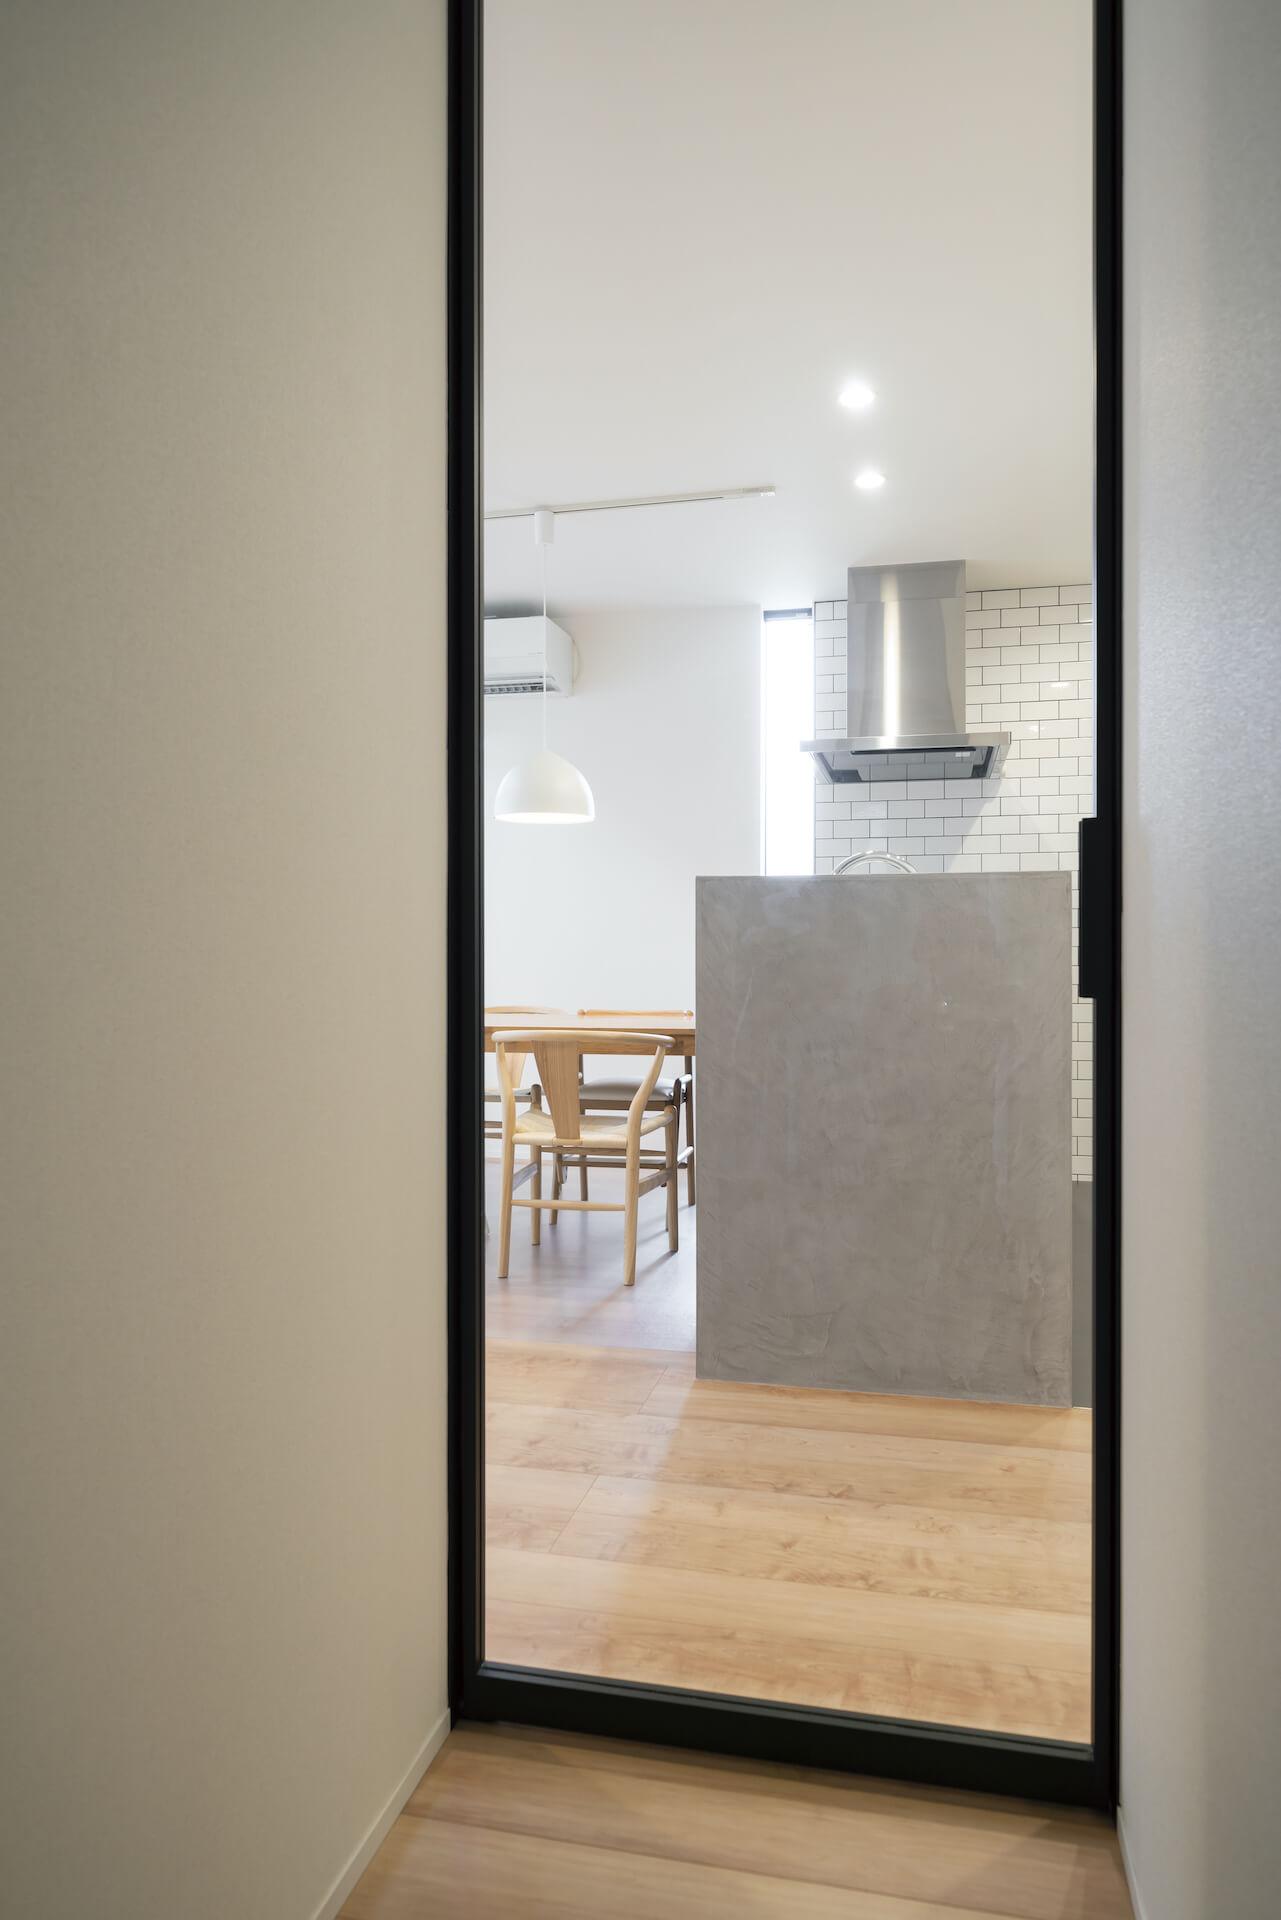 上野工務店,新築,玄関,吹き抜け,茨木市,自社施工